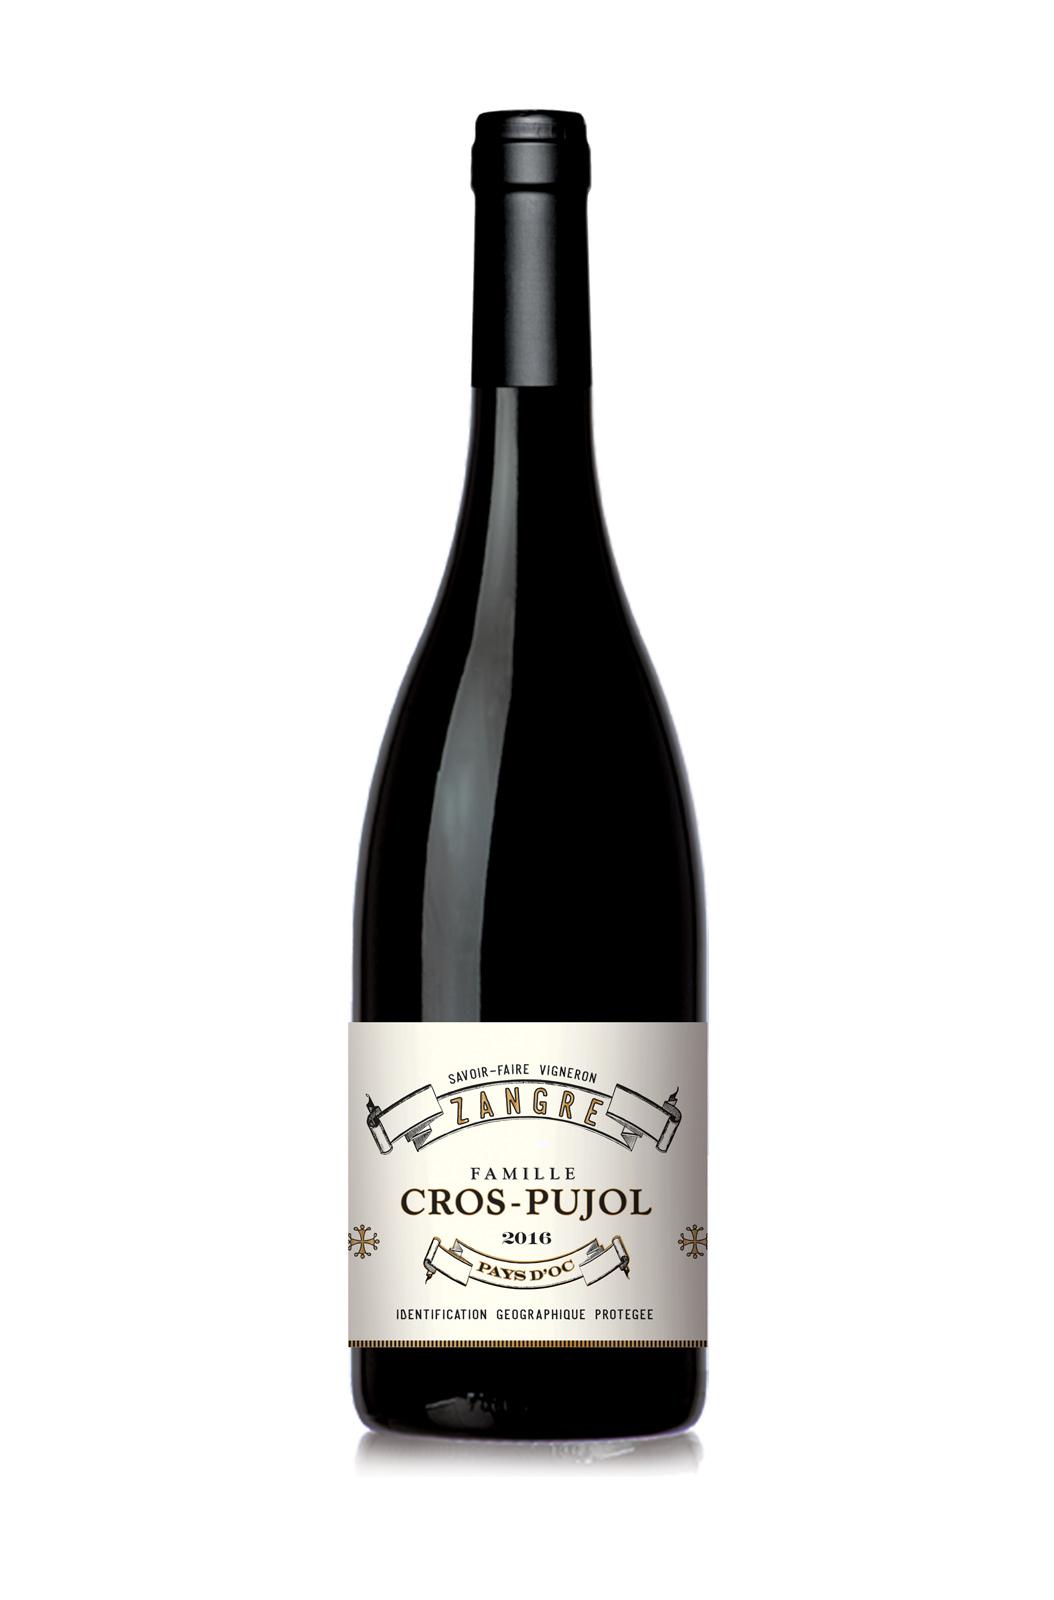 31-famille-cros-pujol-pays-vin-rouge-doc-zangre-2018